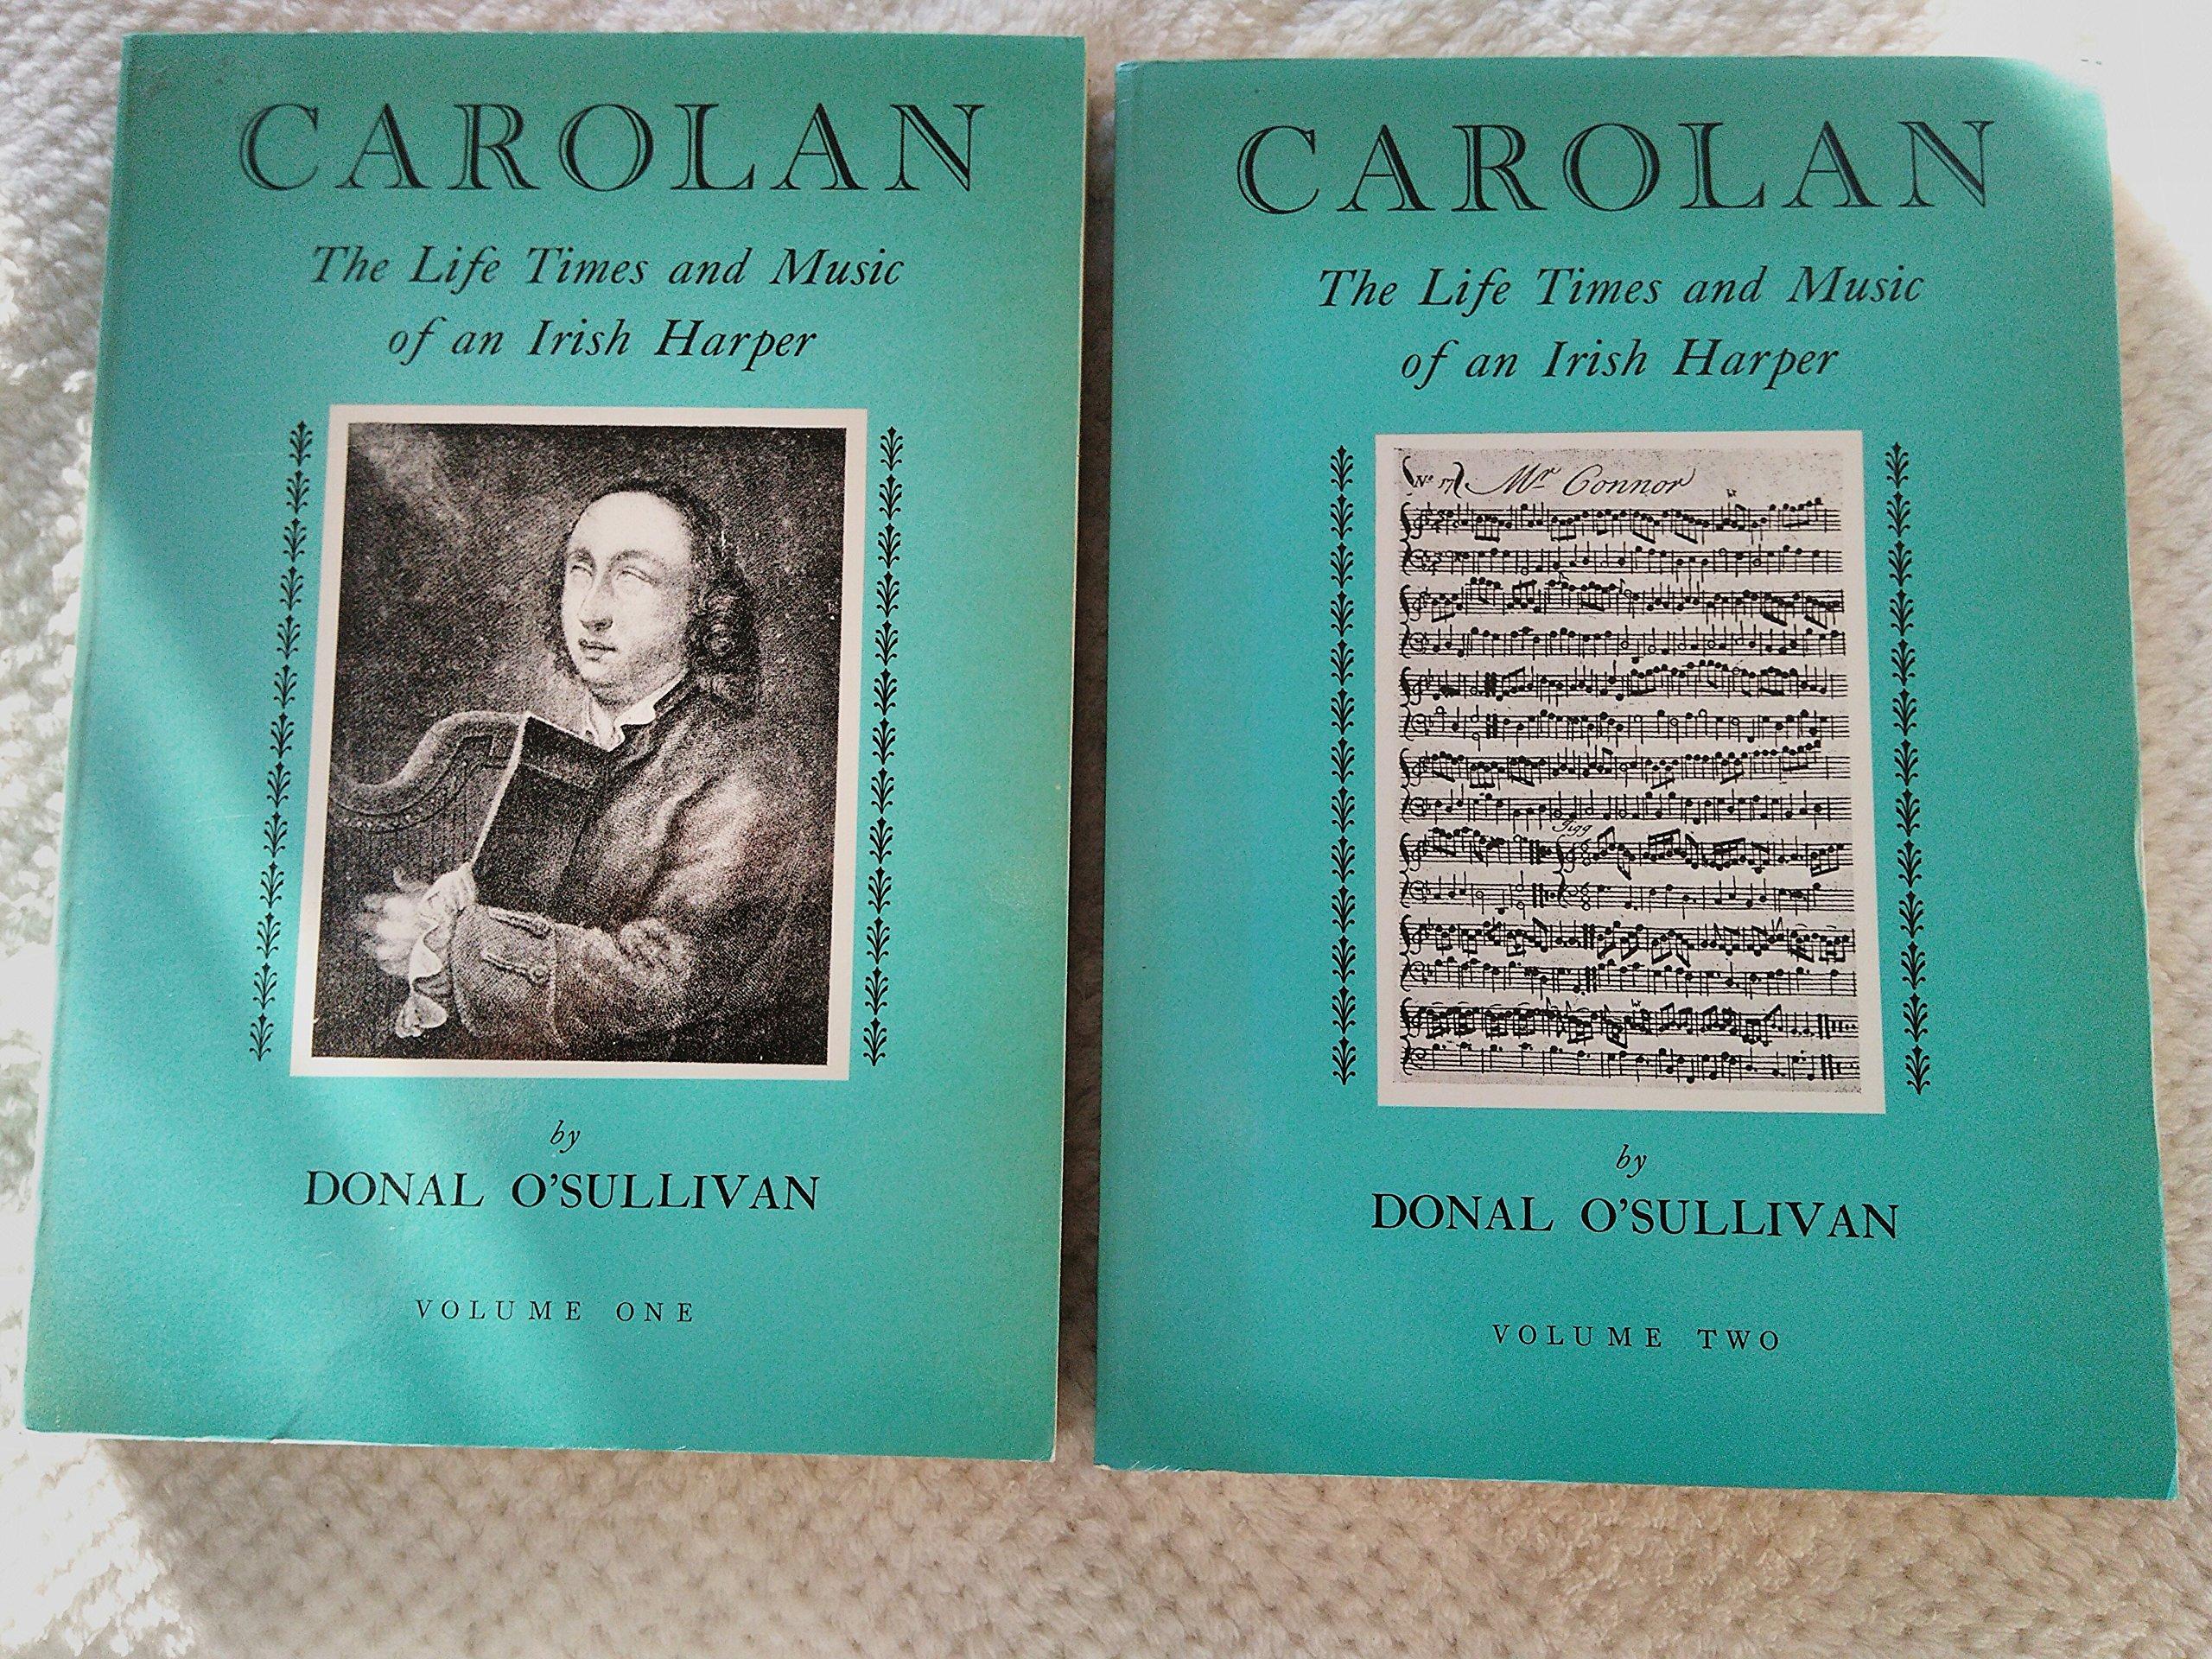 Carolan: The Life Times and Music of an Irish Harper (2 Volumes)